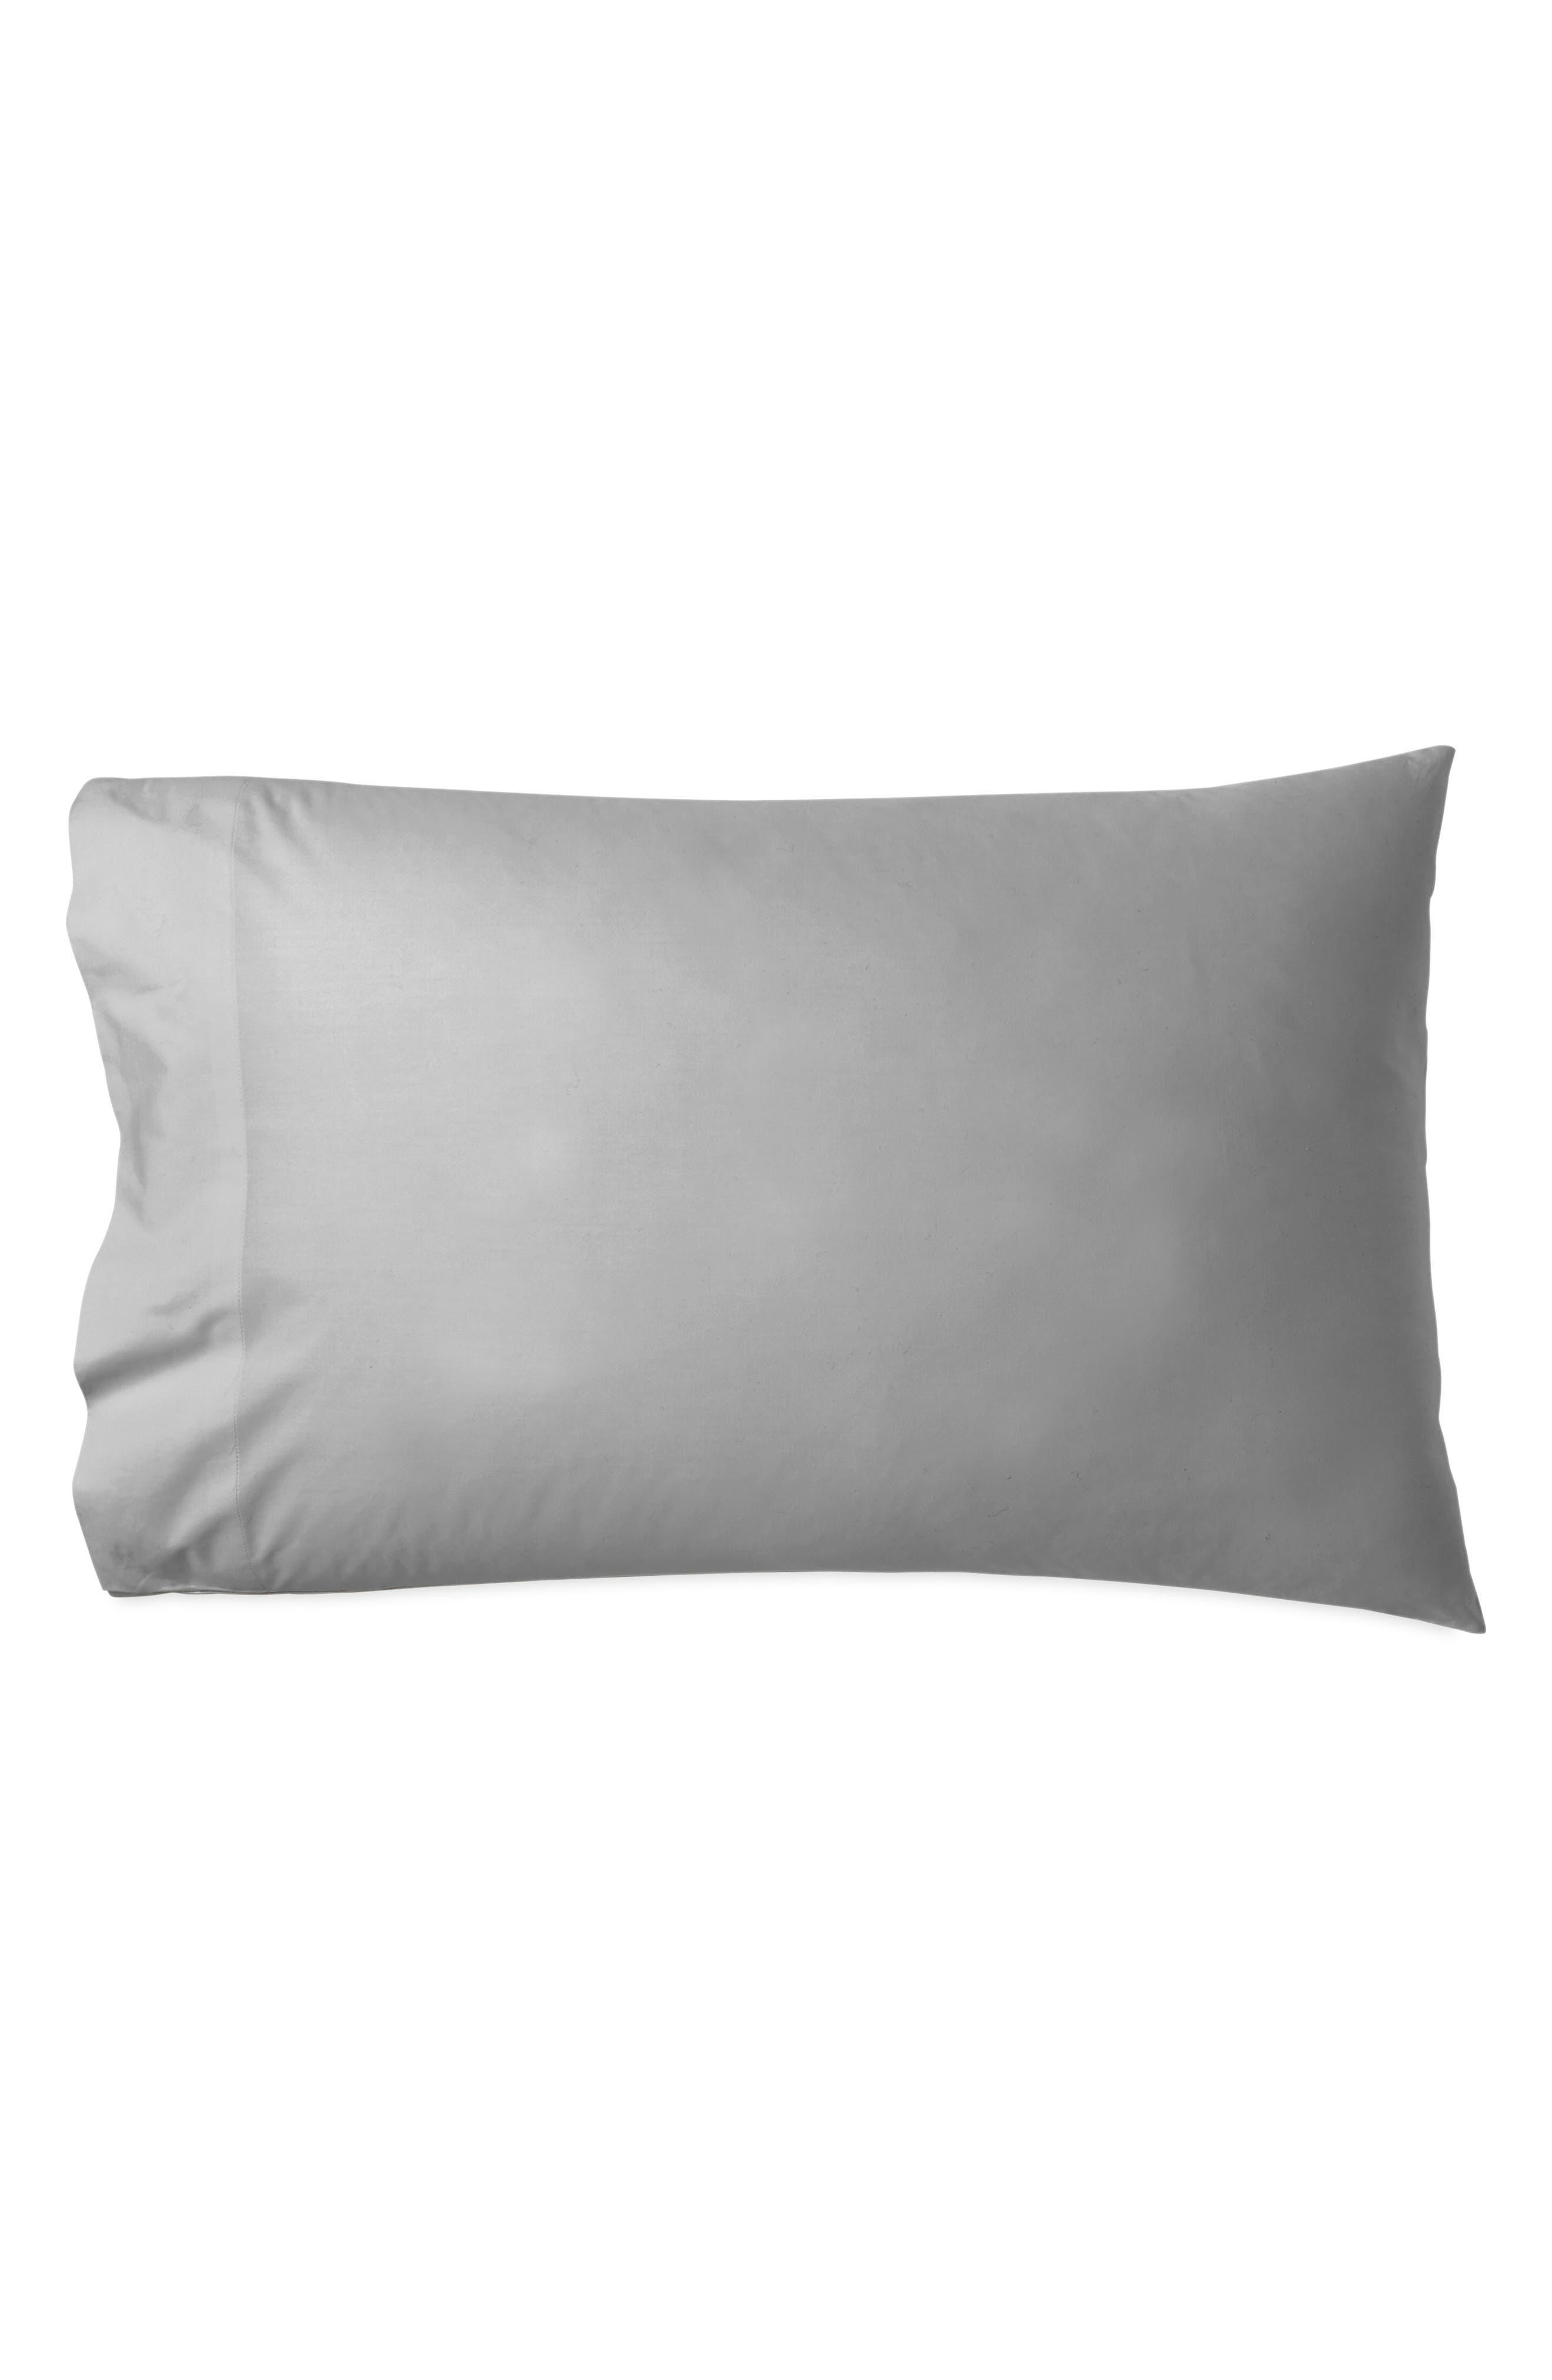 Donna Karan New York Ultrafine 600 Thread Count Pillowcases